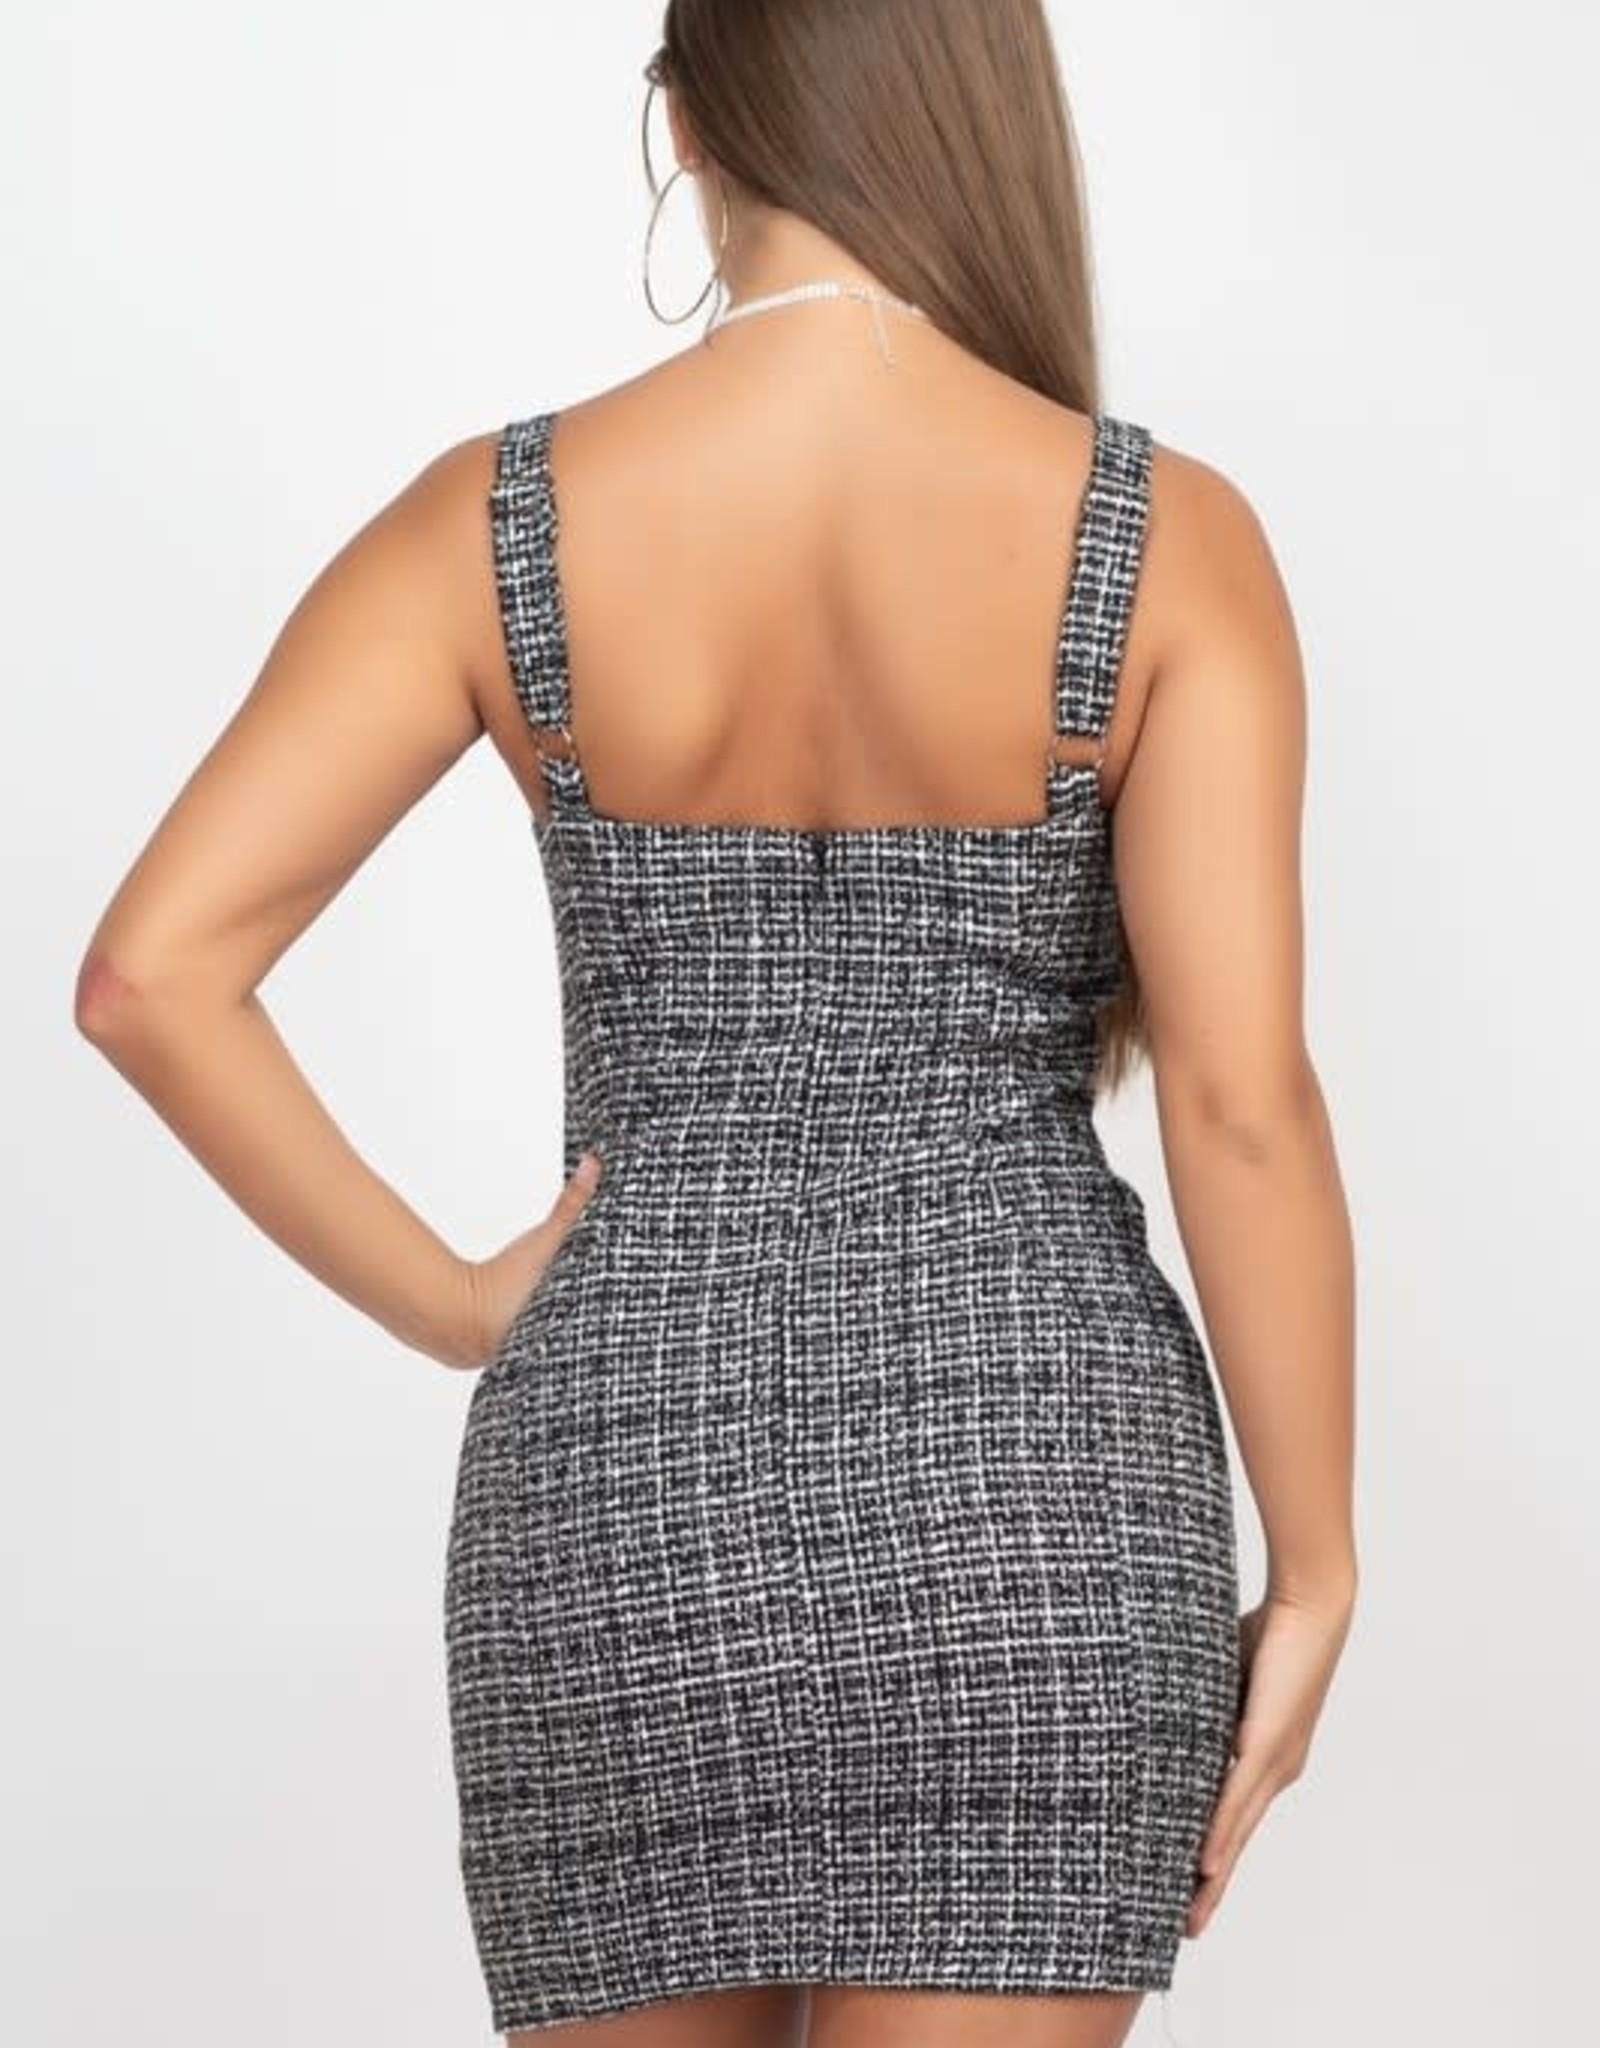 Elle Woods Mini Dress